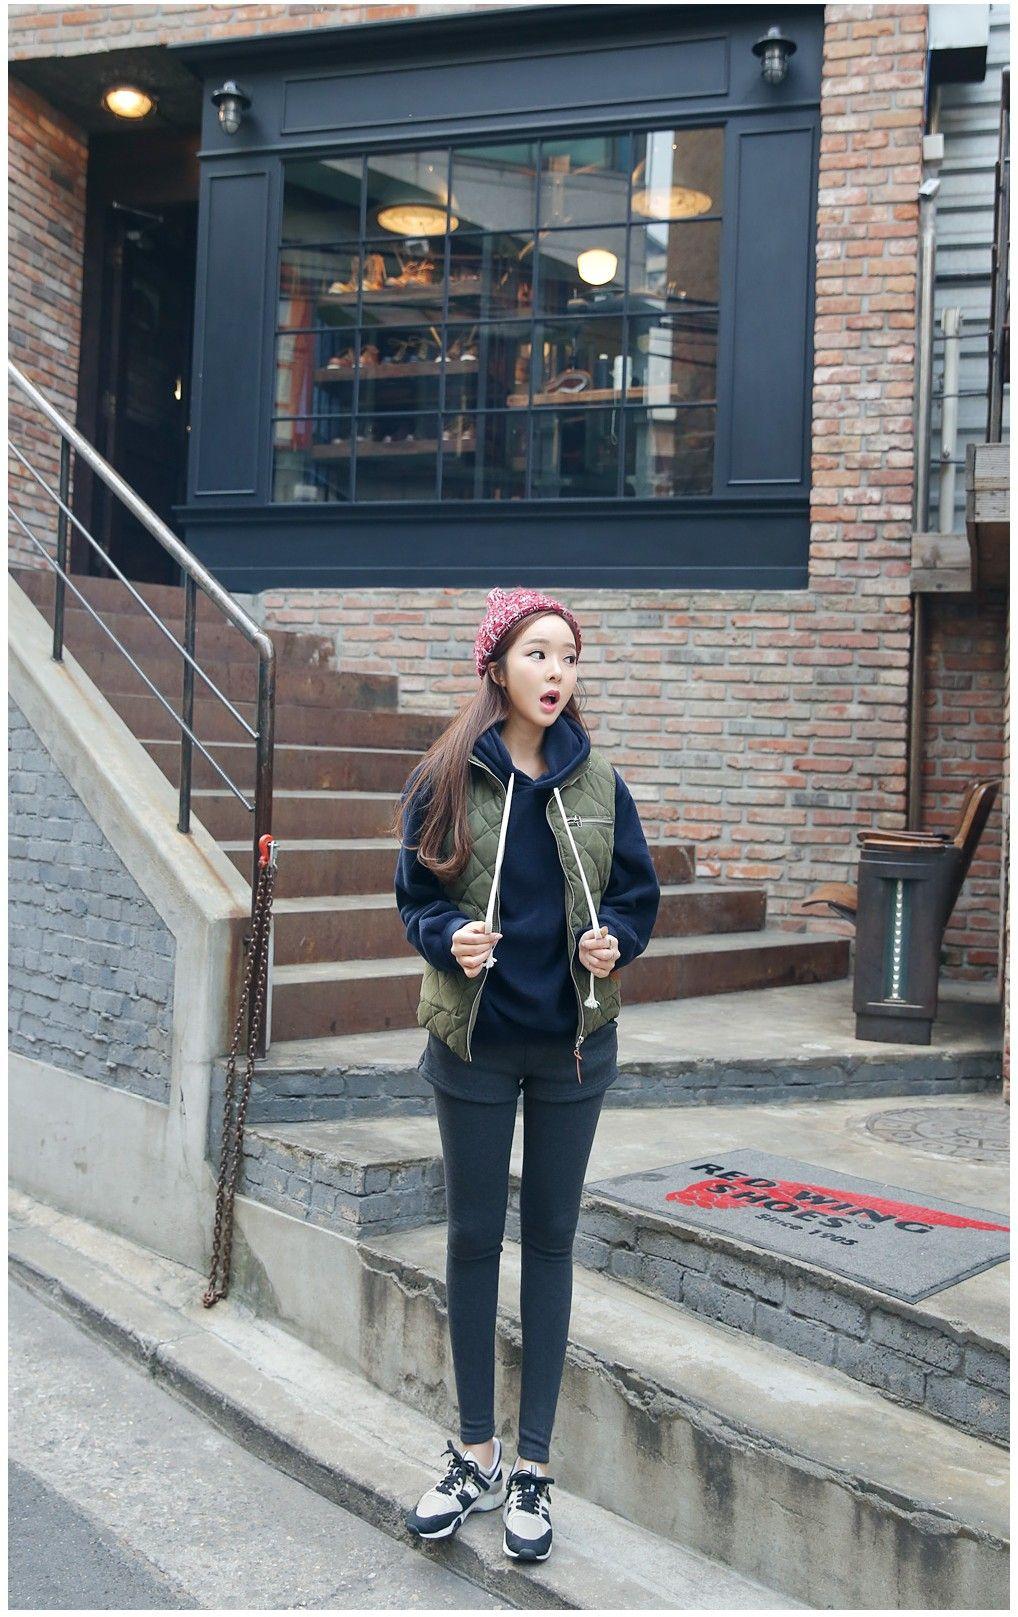 Warm Cotton Candy Tee | Korean Fashion